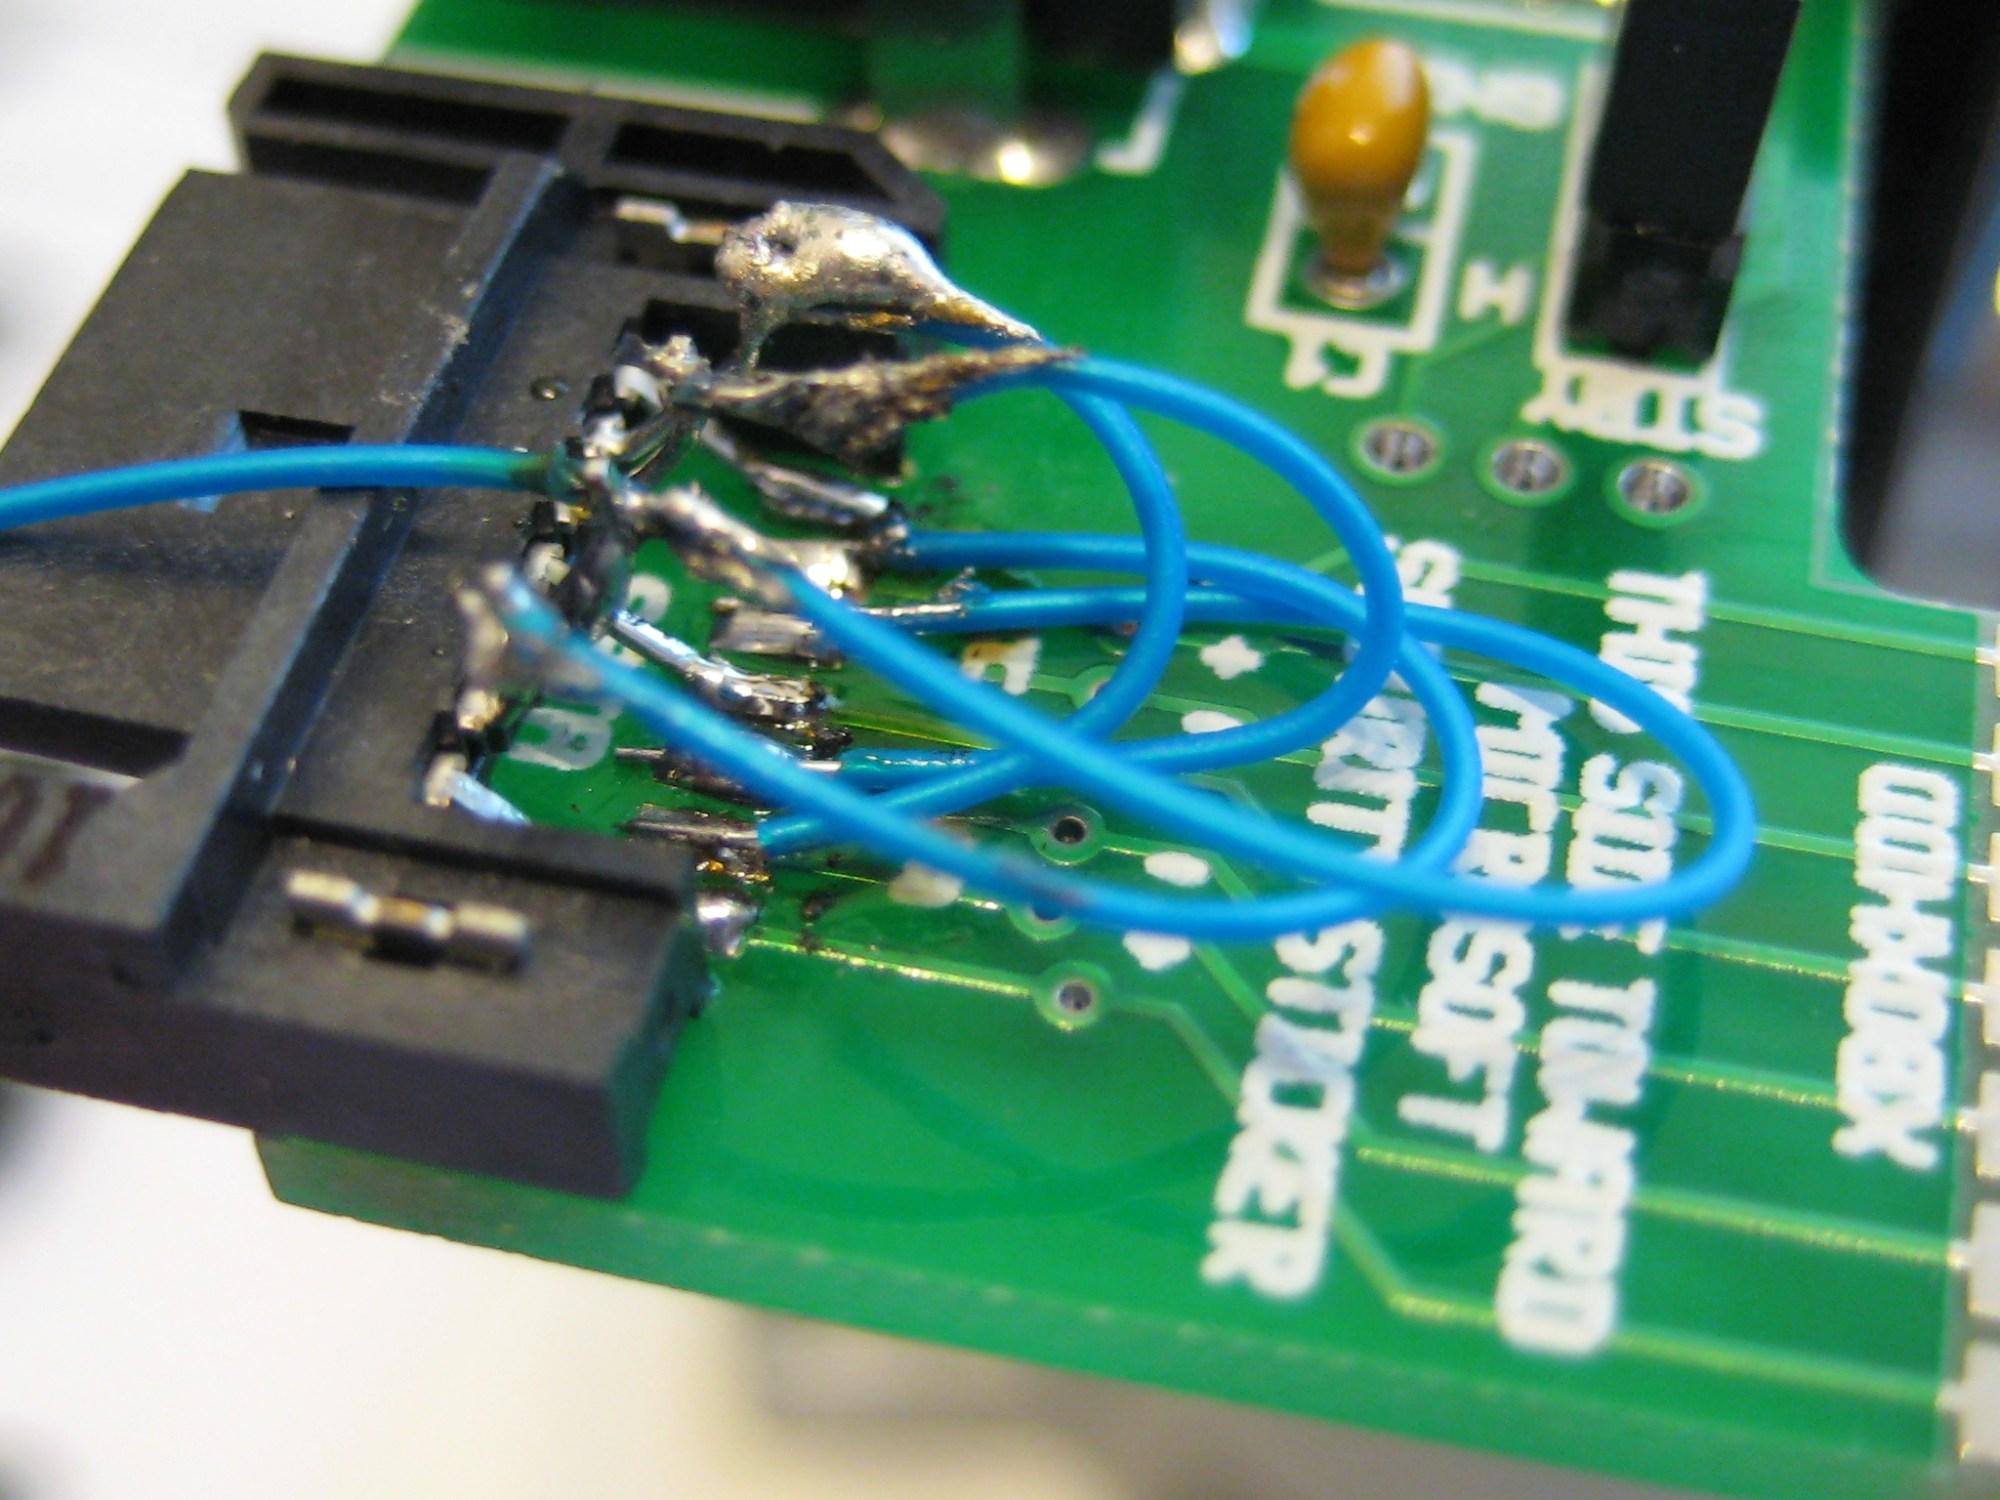 hight resolution of hitachi sata hard drive wiring diagram wiring library rh 60 skriptoase de 6 pin connector diagram sata data to usb wiring diagram